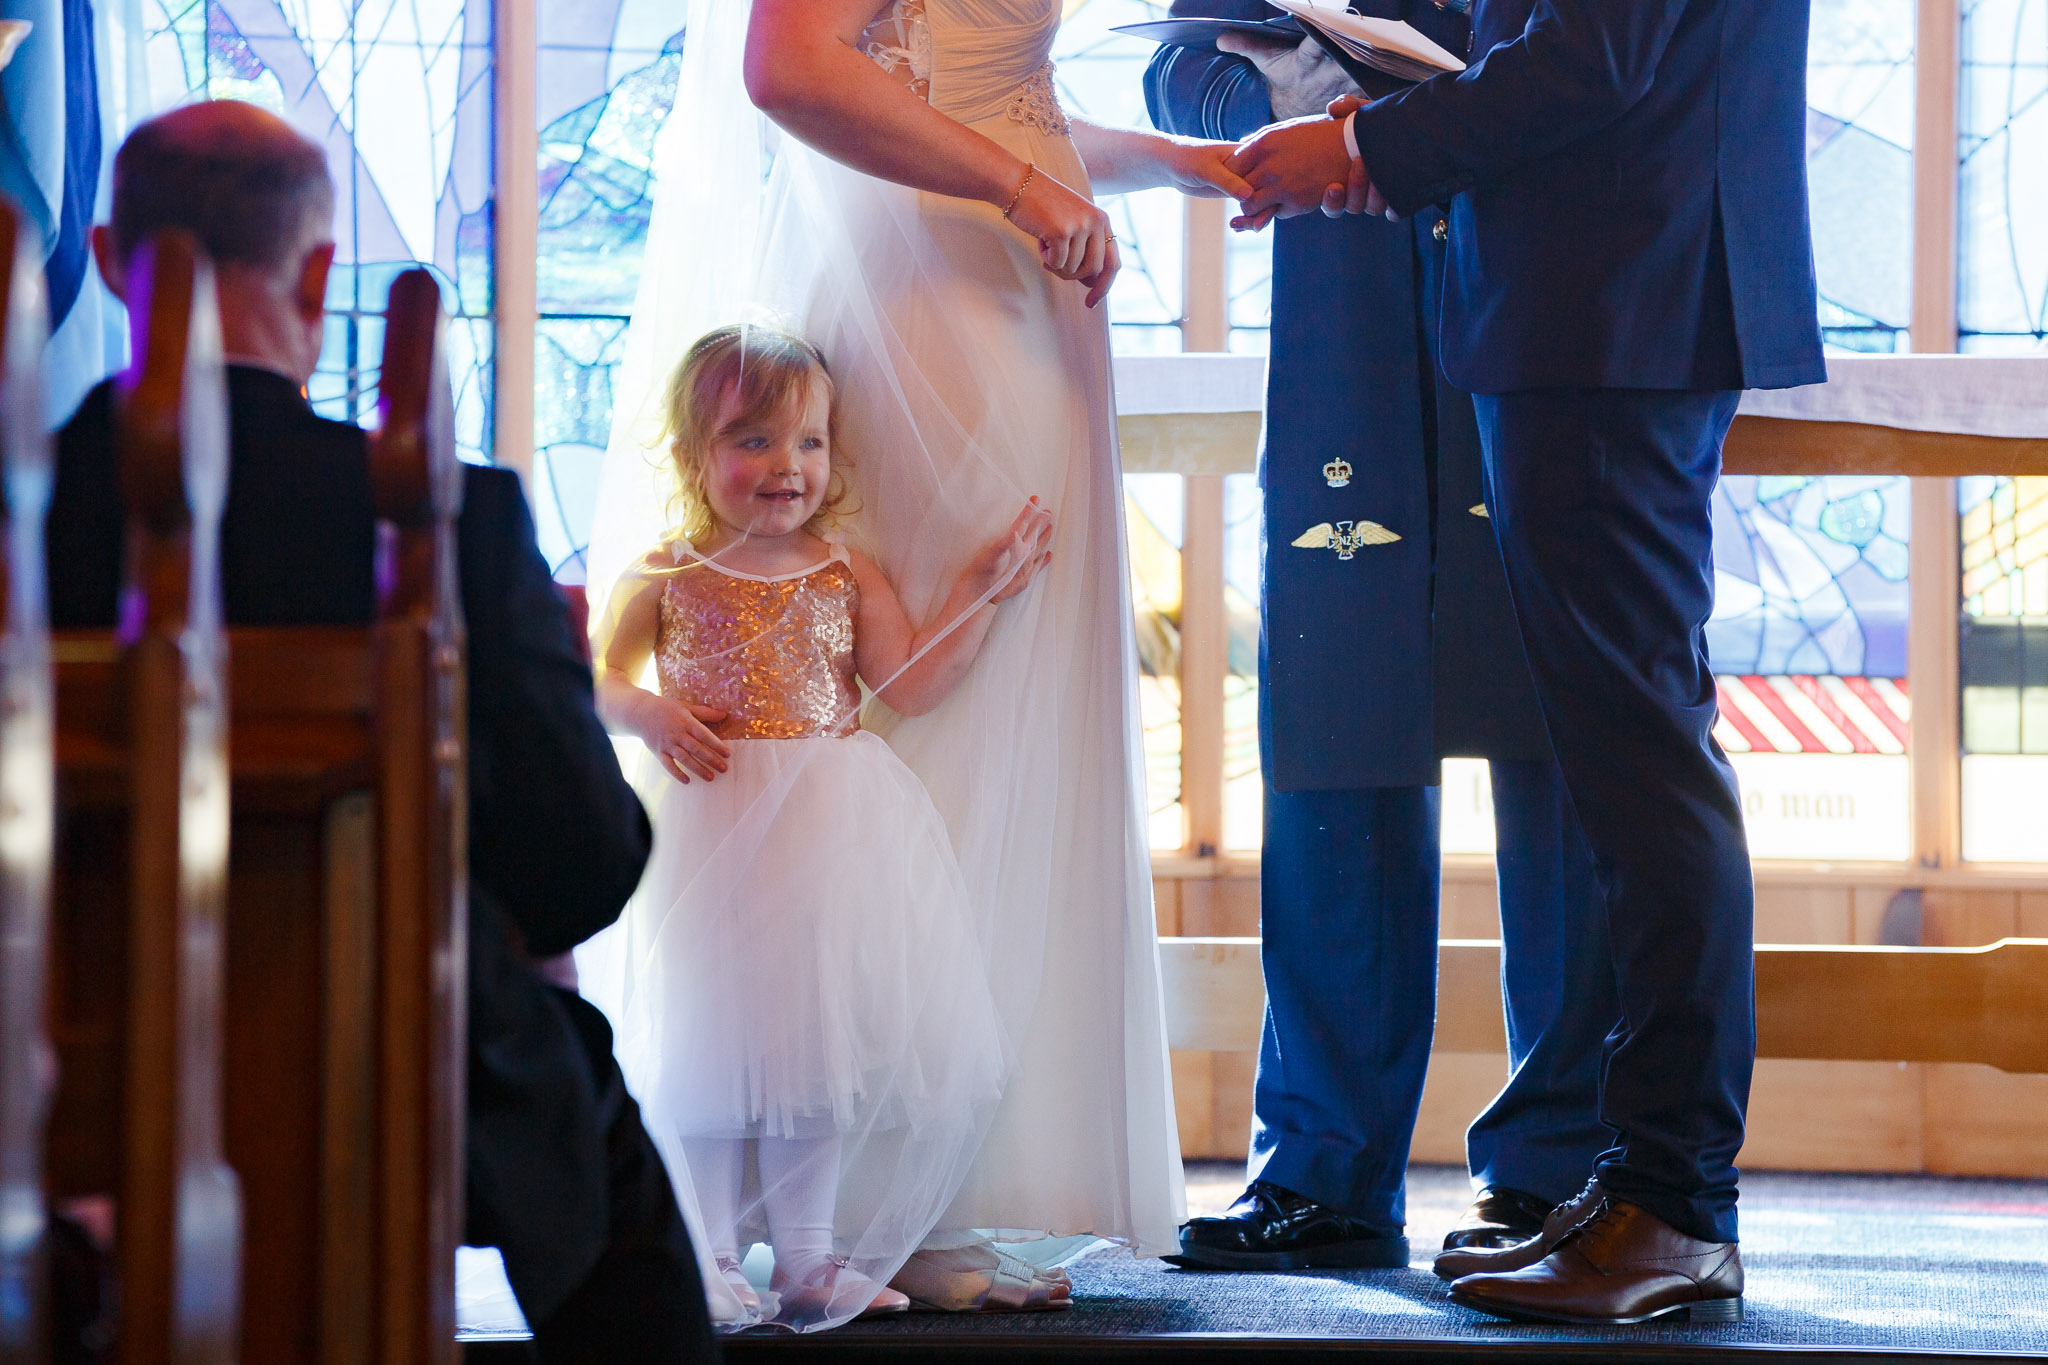 highlight_wedding_photography_manawatu_palmerston_north_new_zealand_rangitikei_golf_ohakea-21.jpg